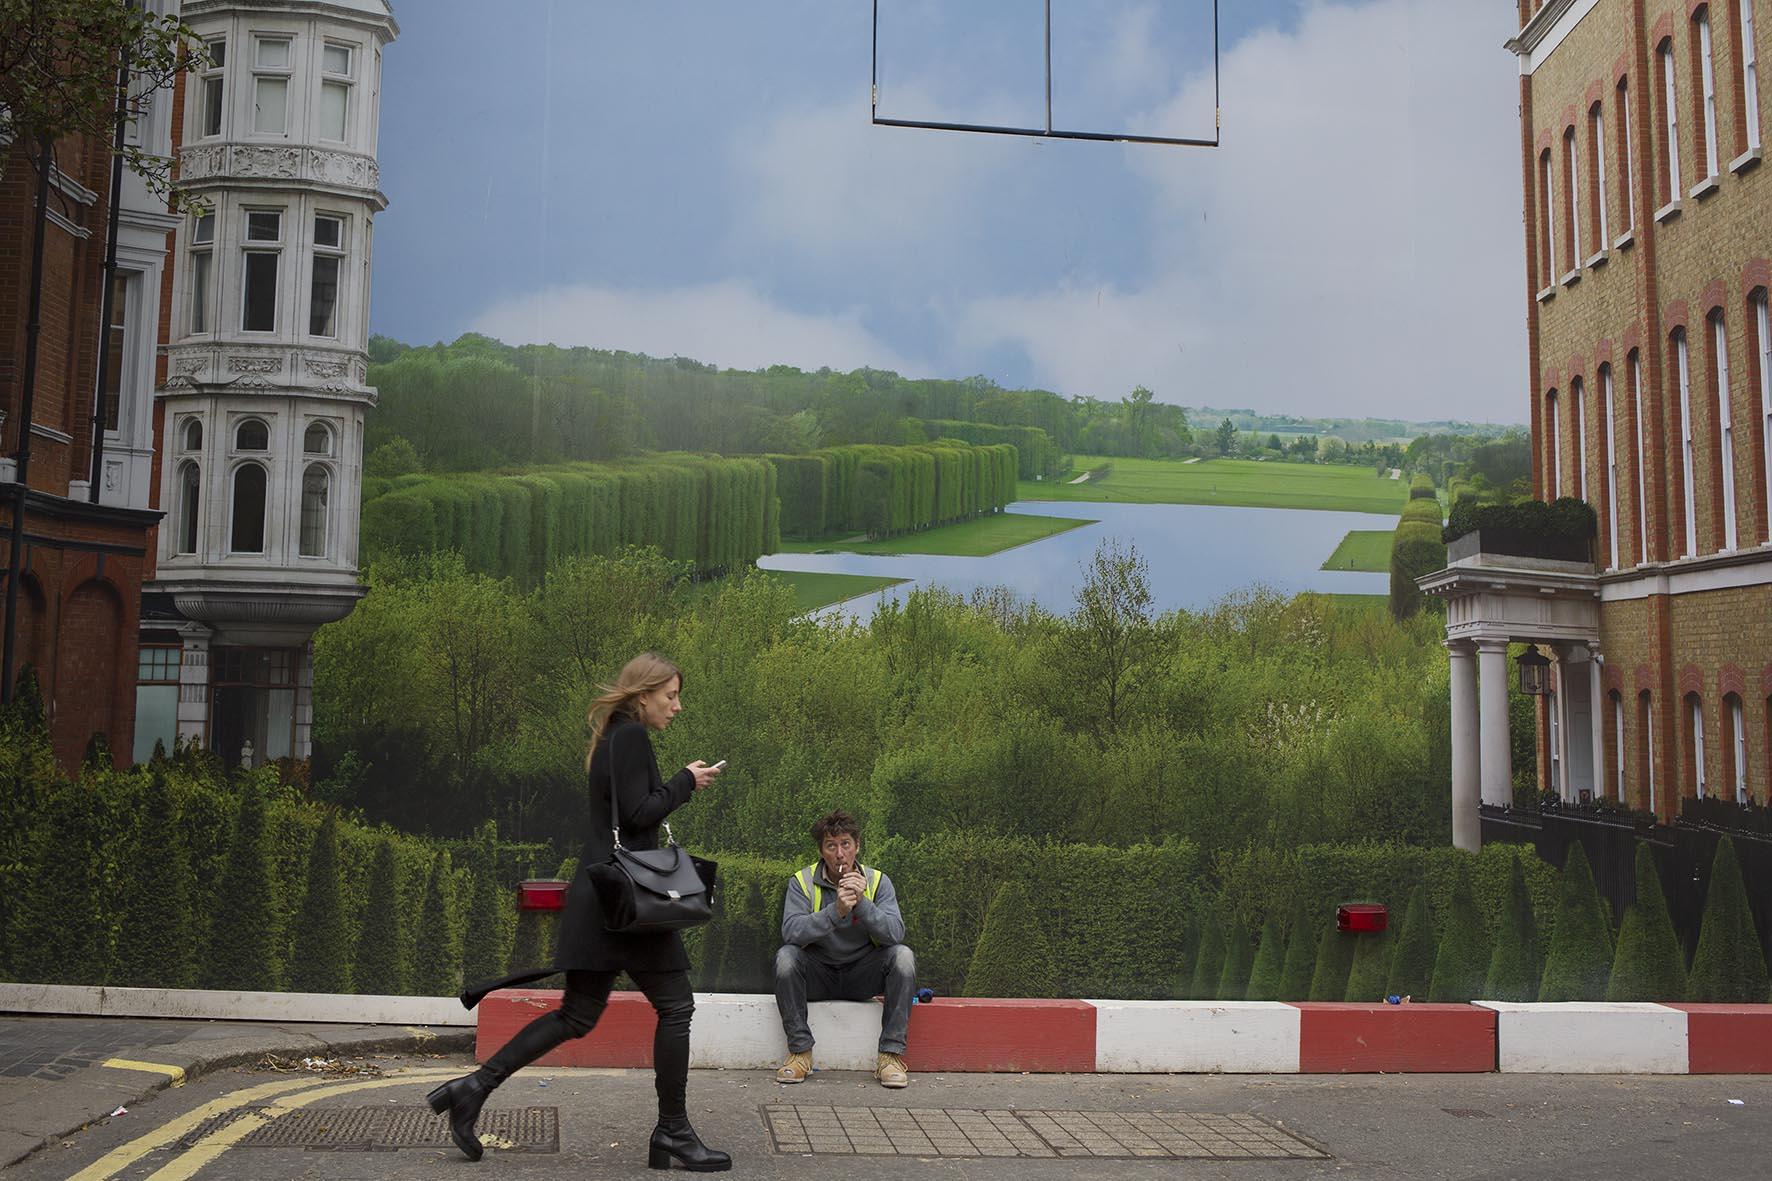 Bond Street hoarding. Copyright: Mike Kemp